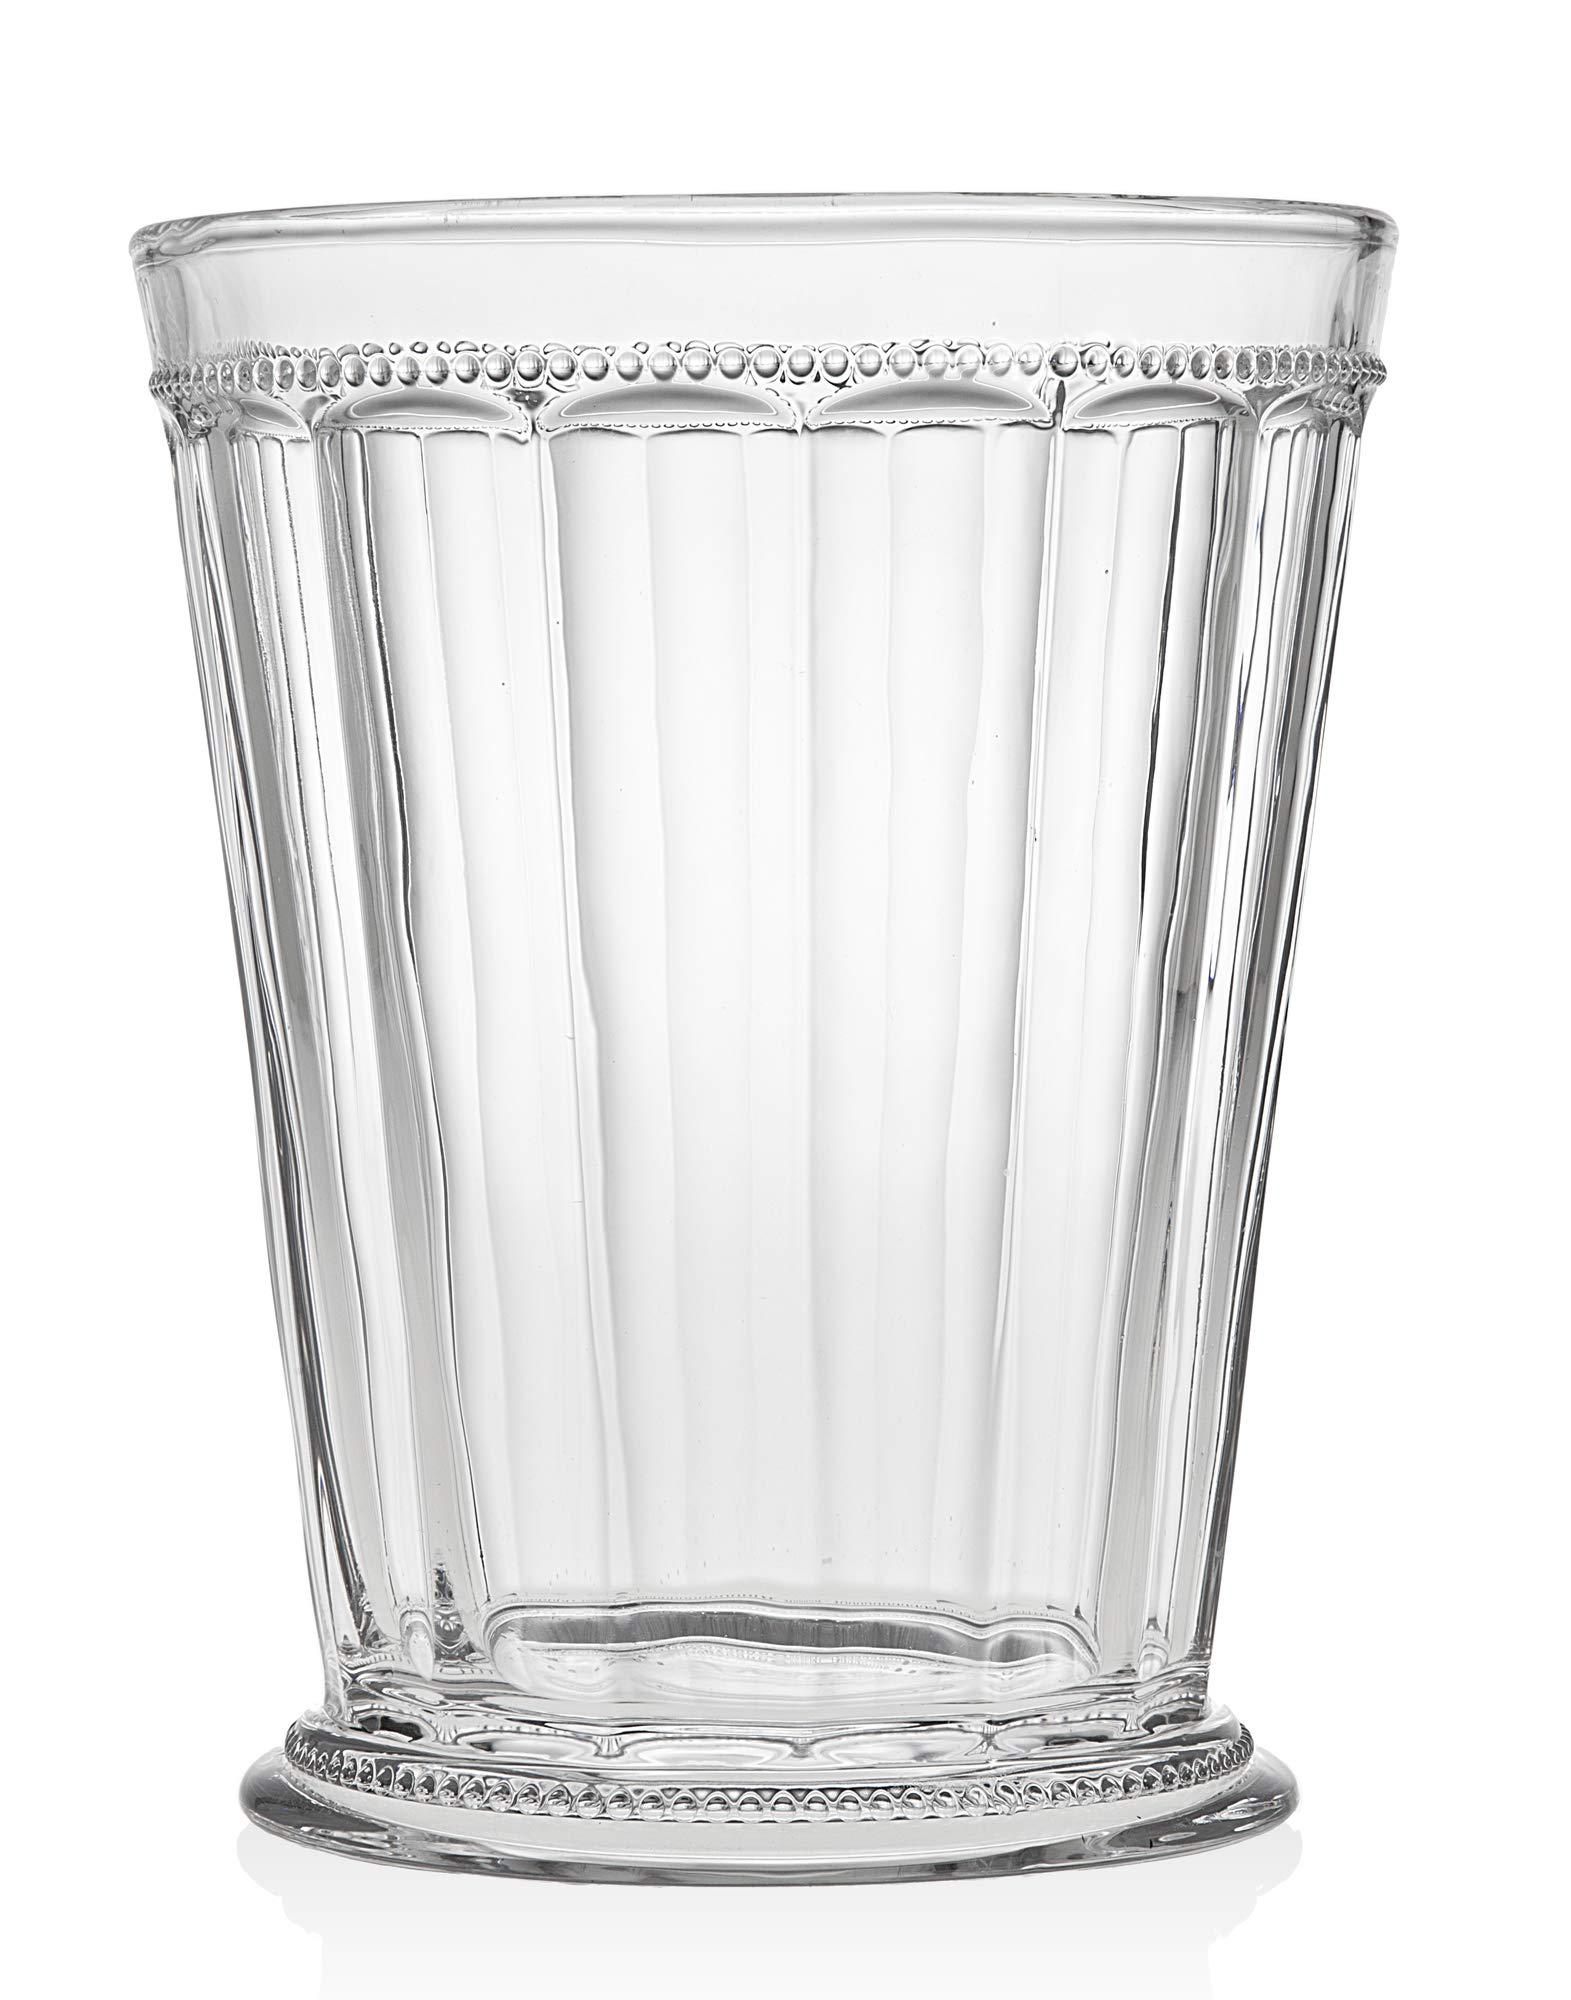 Godinger Hamilton House Bath Bucket Crystal Wastebasket Garbage Can